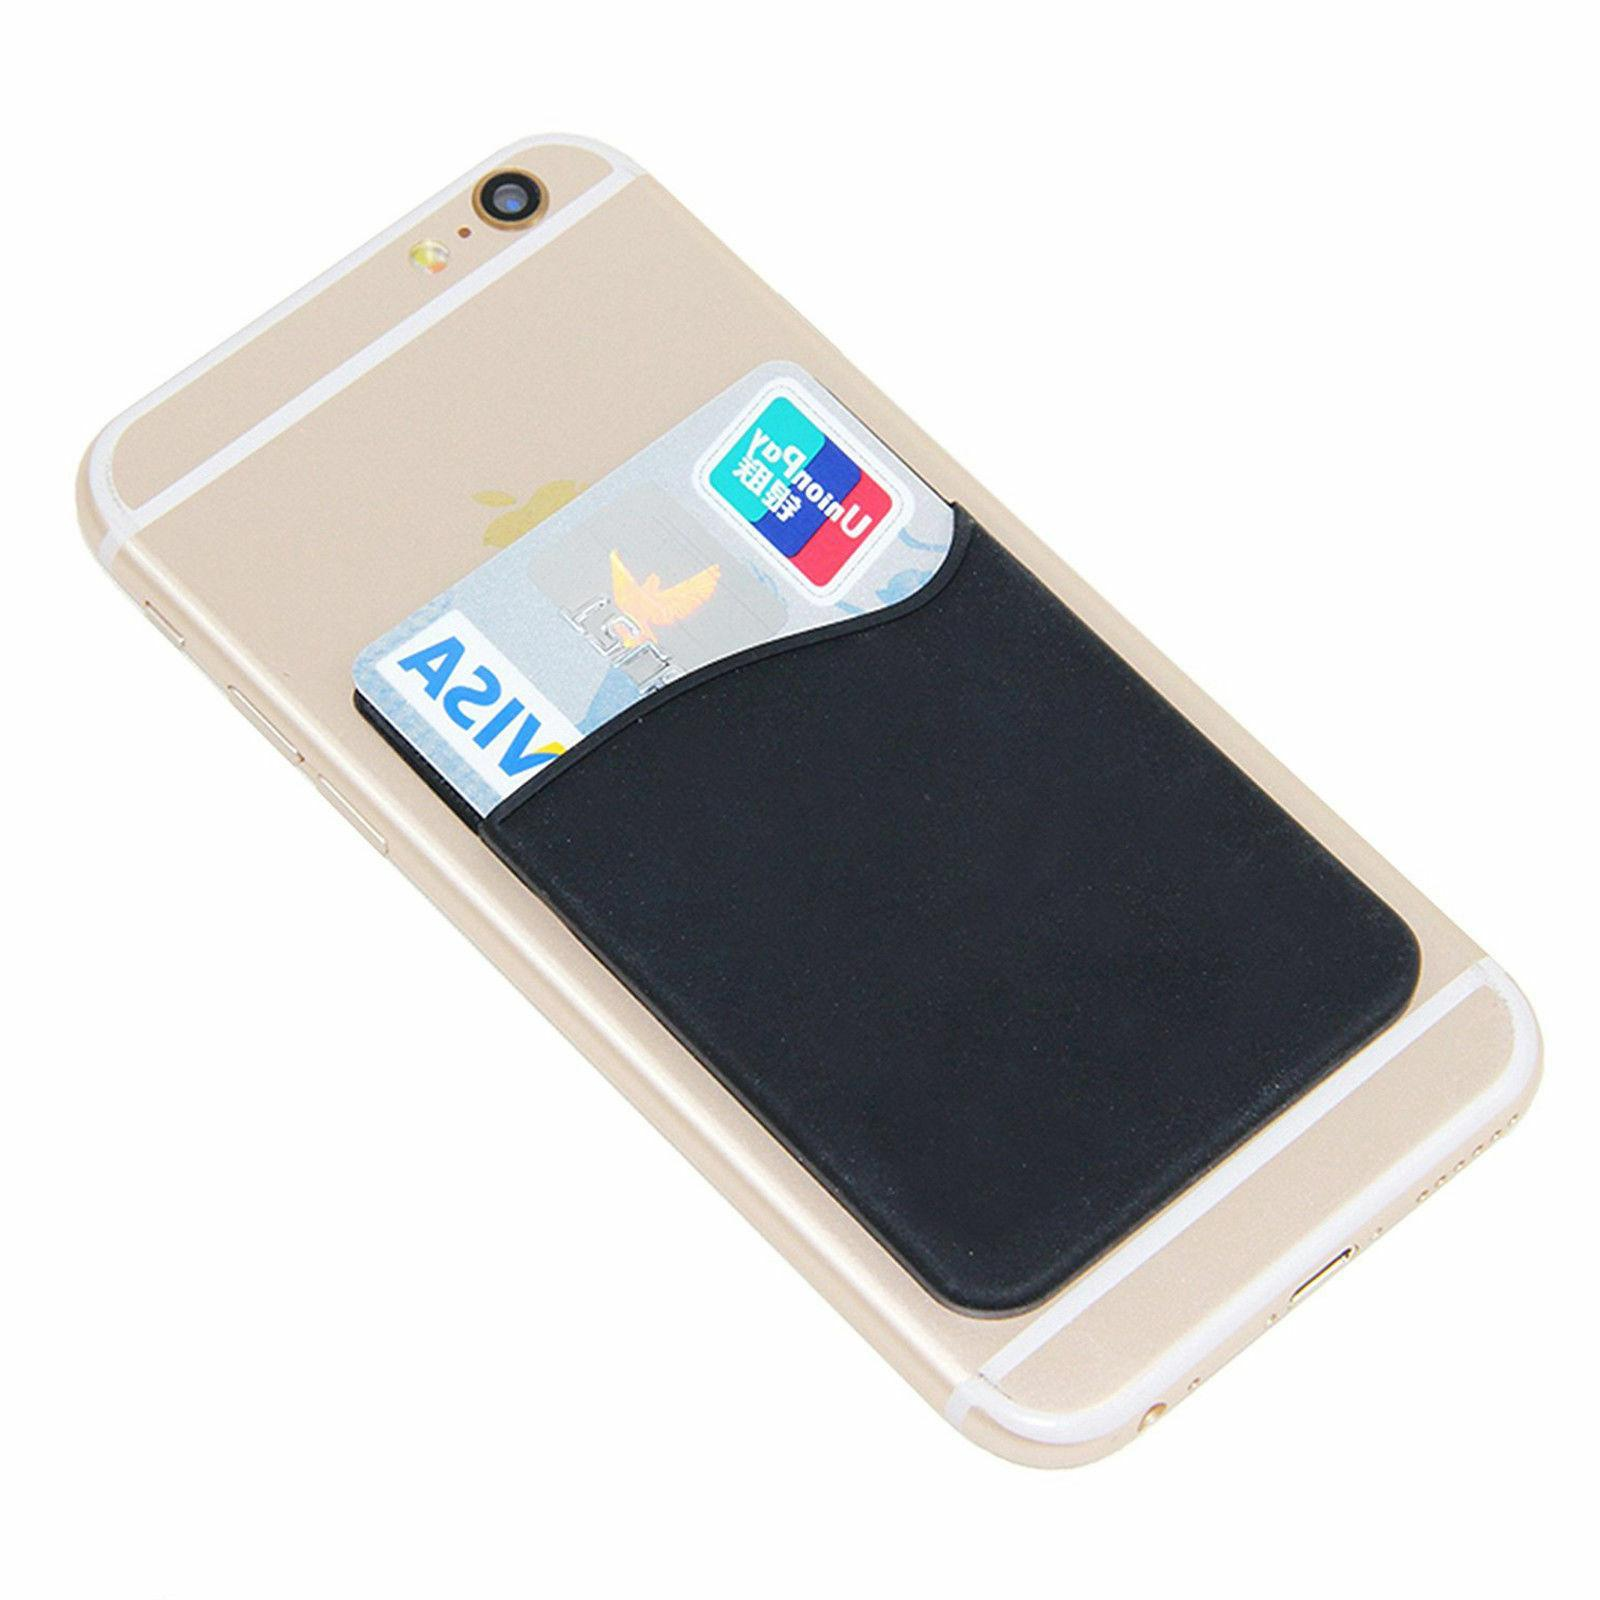 Adhesive Silicone Card Pocket Case